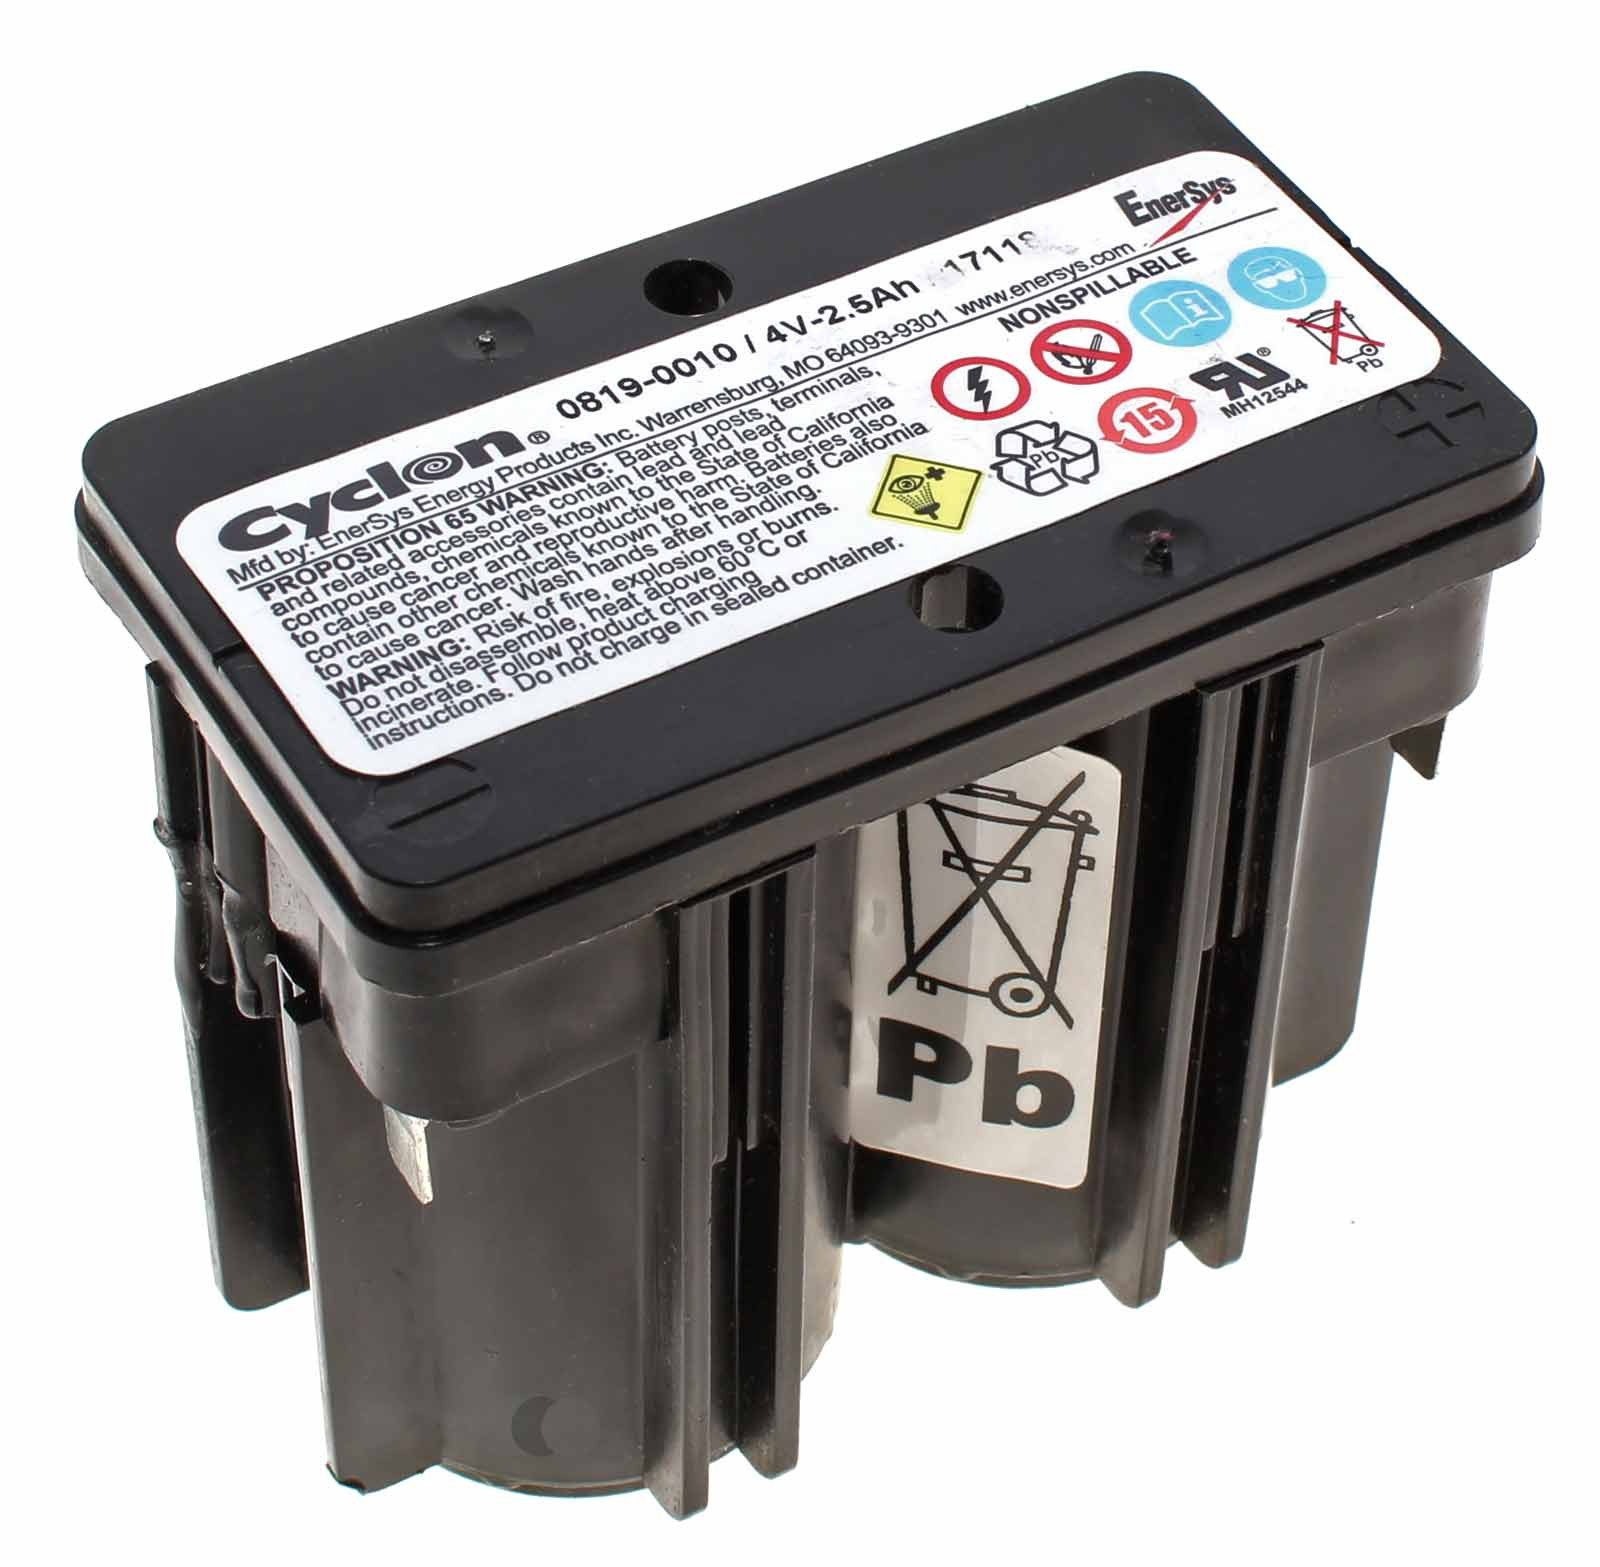 Blei Akku Hawker Enersys Cyclon 0819-0010 Monobloc D cell mit 4 Volt und 2,5Ah Kapazität